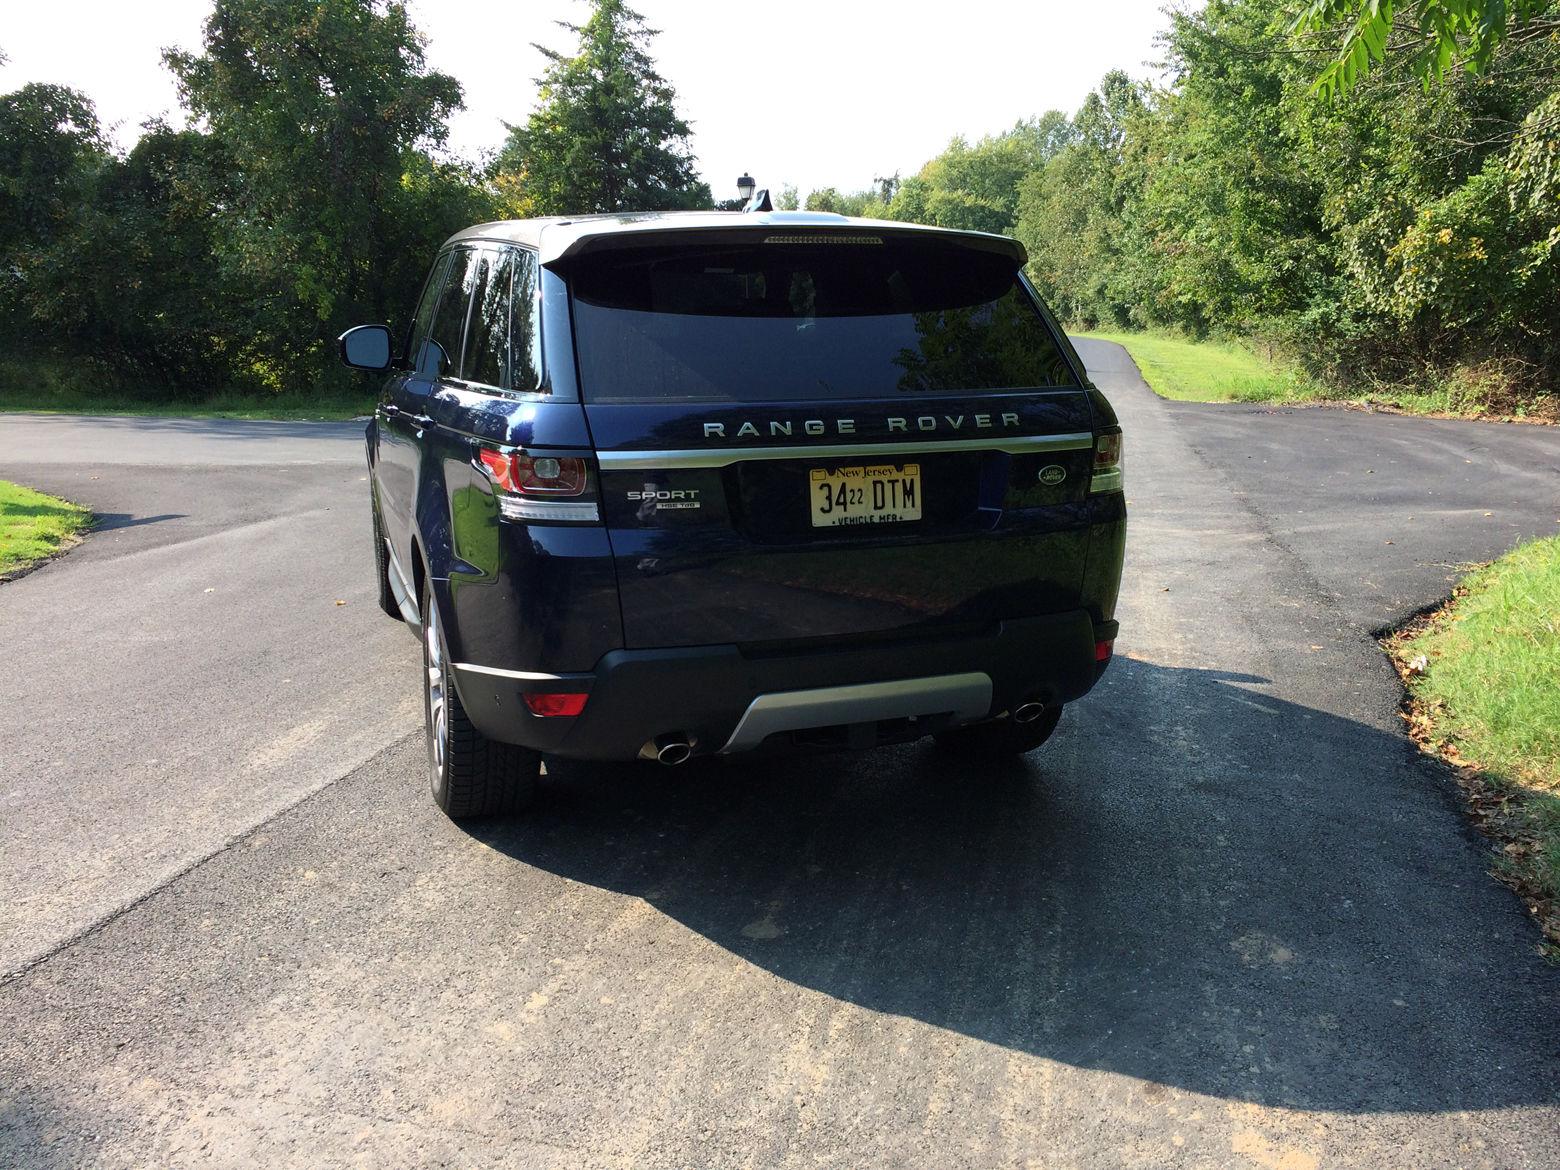 Range Rover Sport HSE Td6: Diesel fuel mileage with plenty